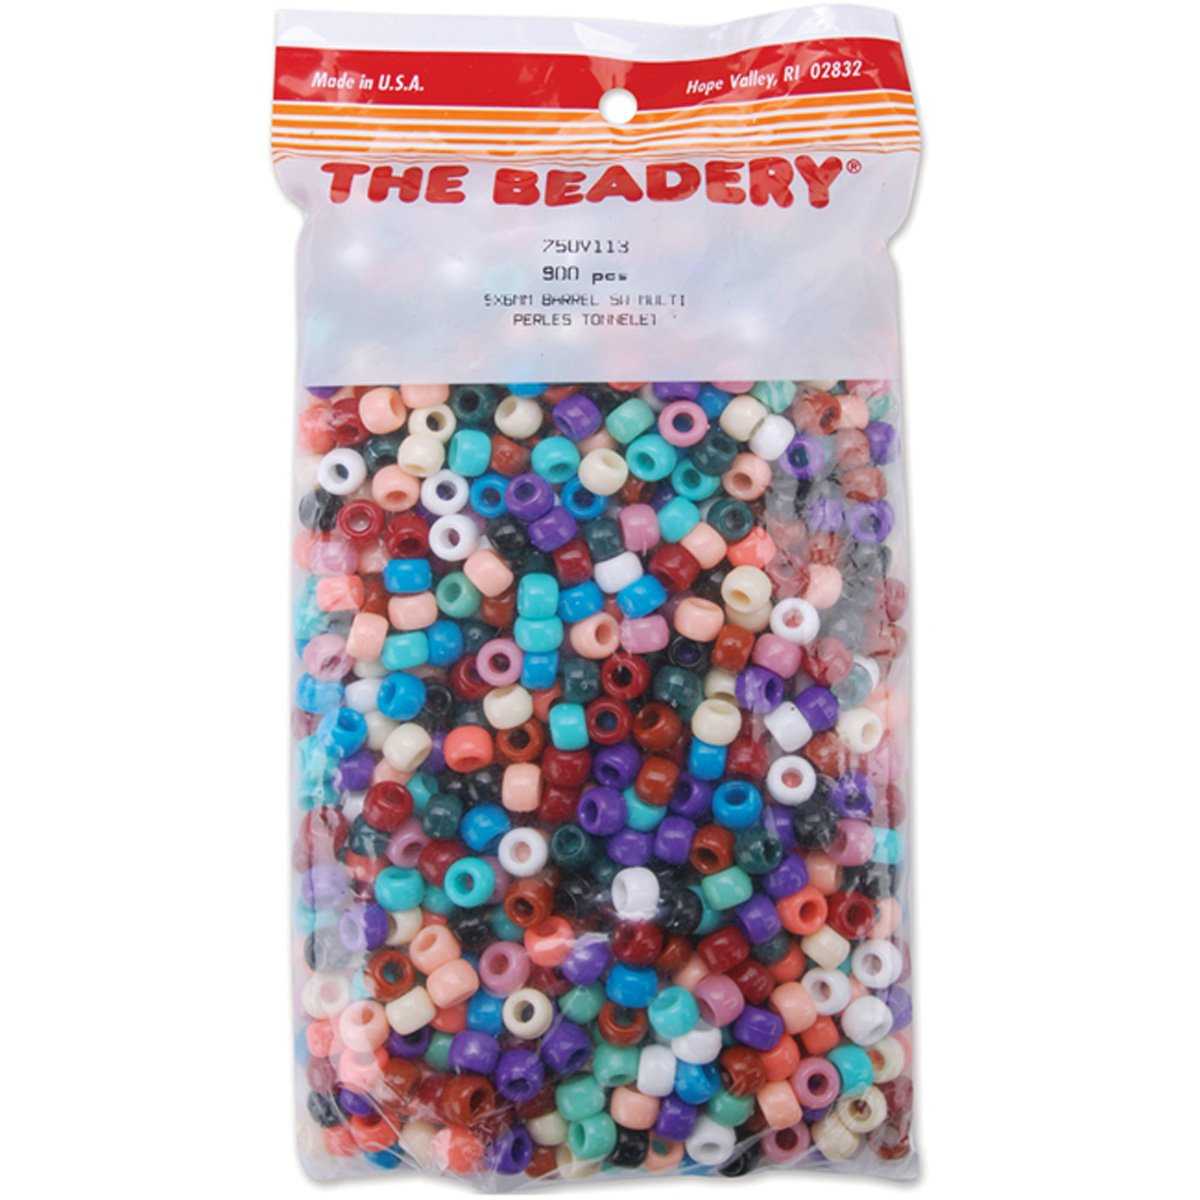 Beadery Pony Beads, 6x9mm, Southwest, Multicolor, 900-Pack 750V-113